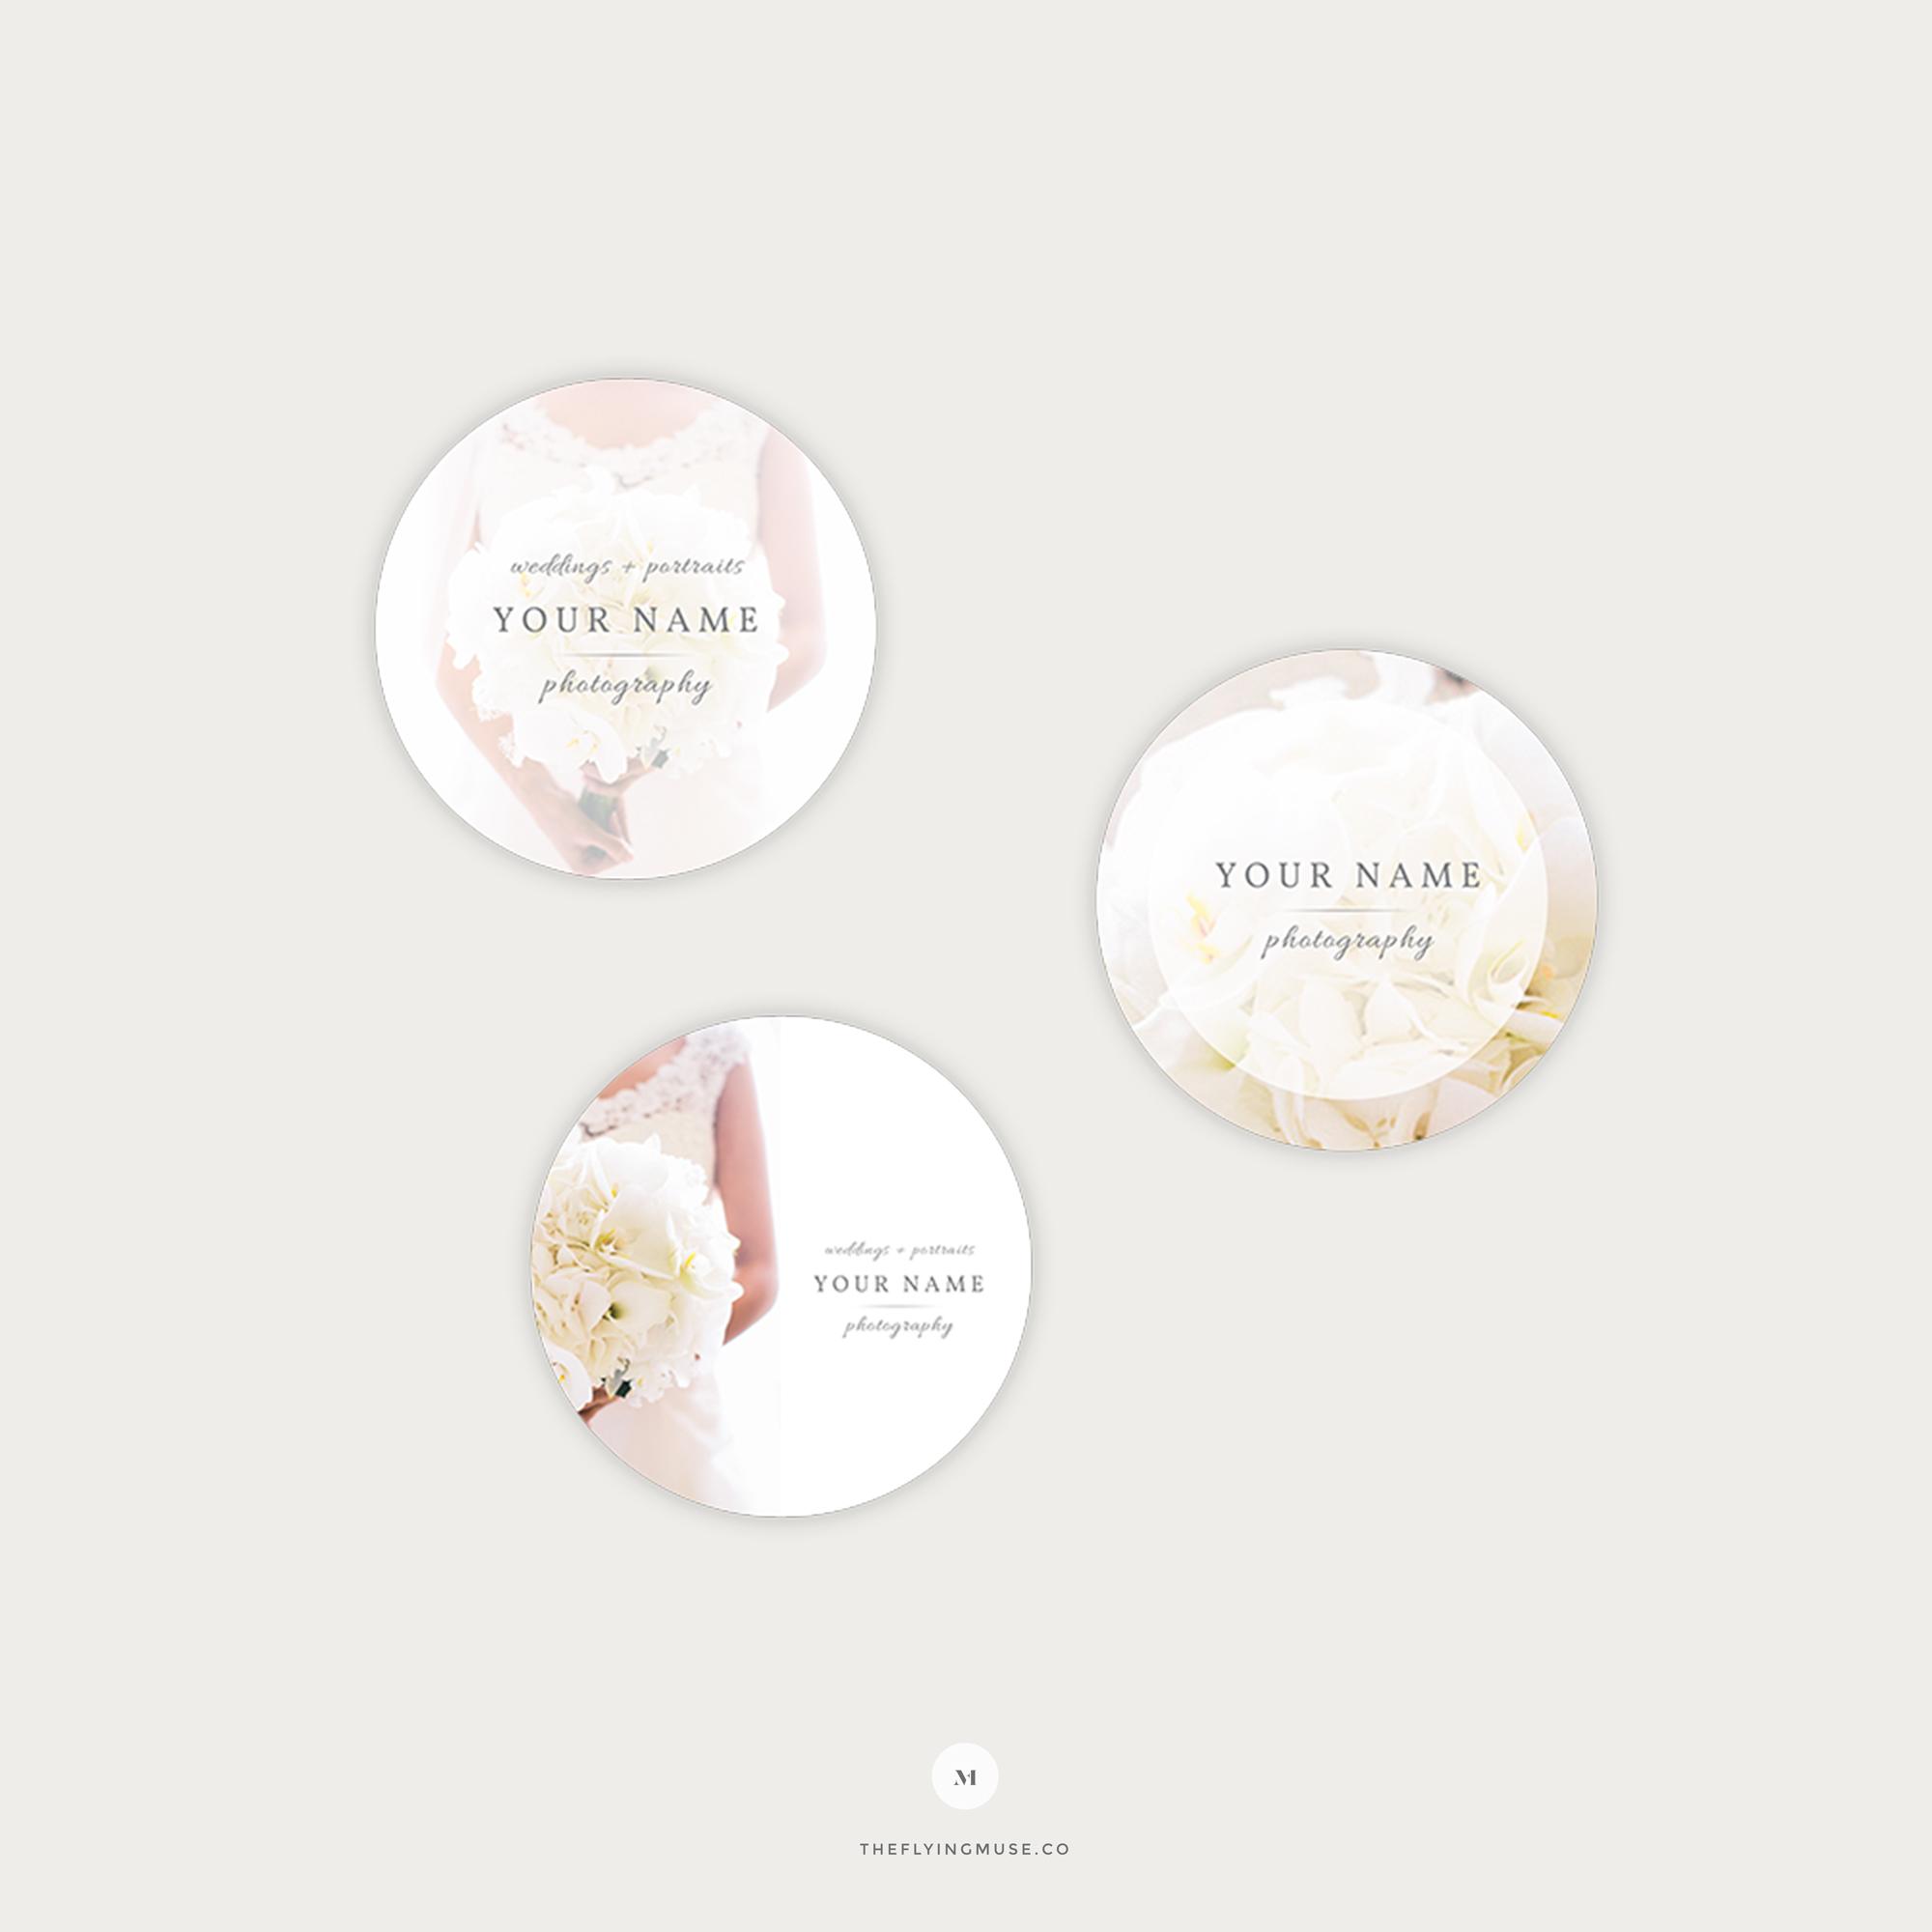 Elegant Round Sticker Templates For Wedding Photographers The